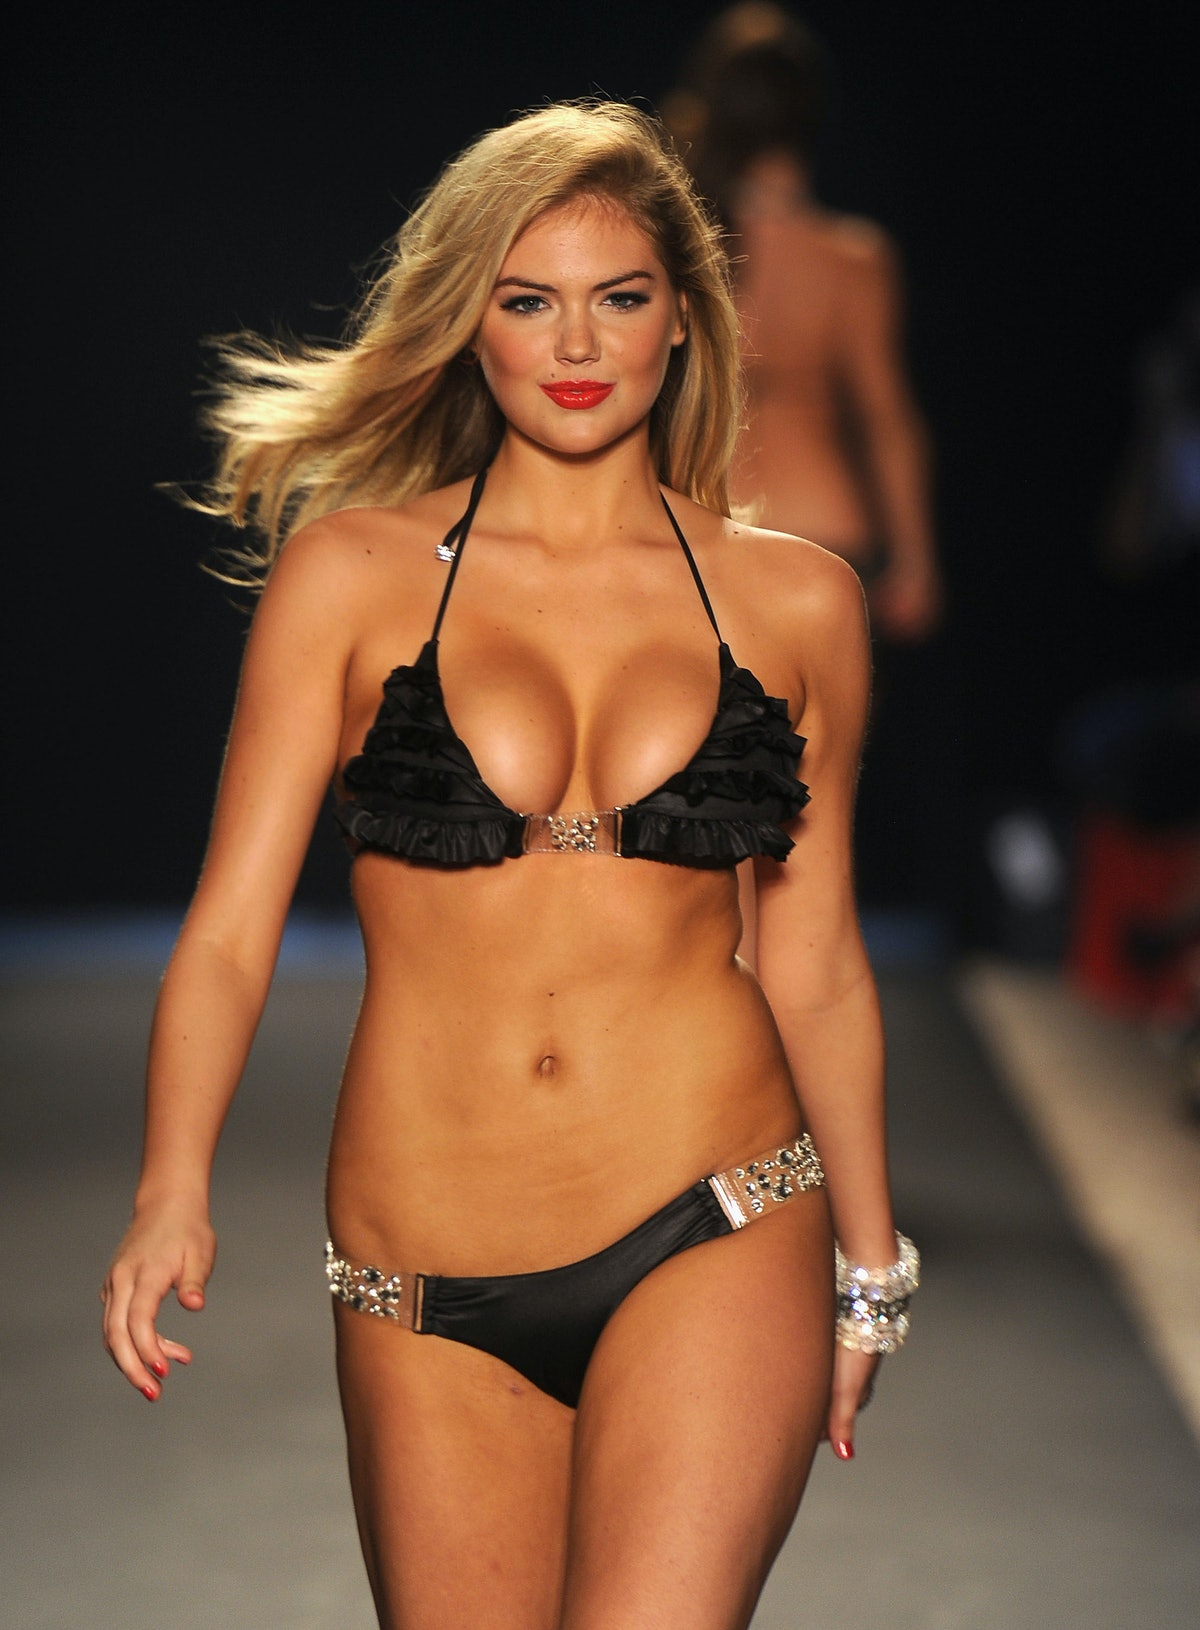 Bikini for bigger bust